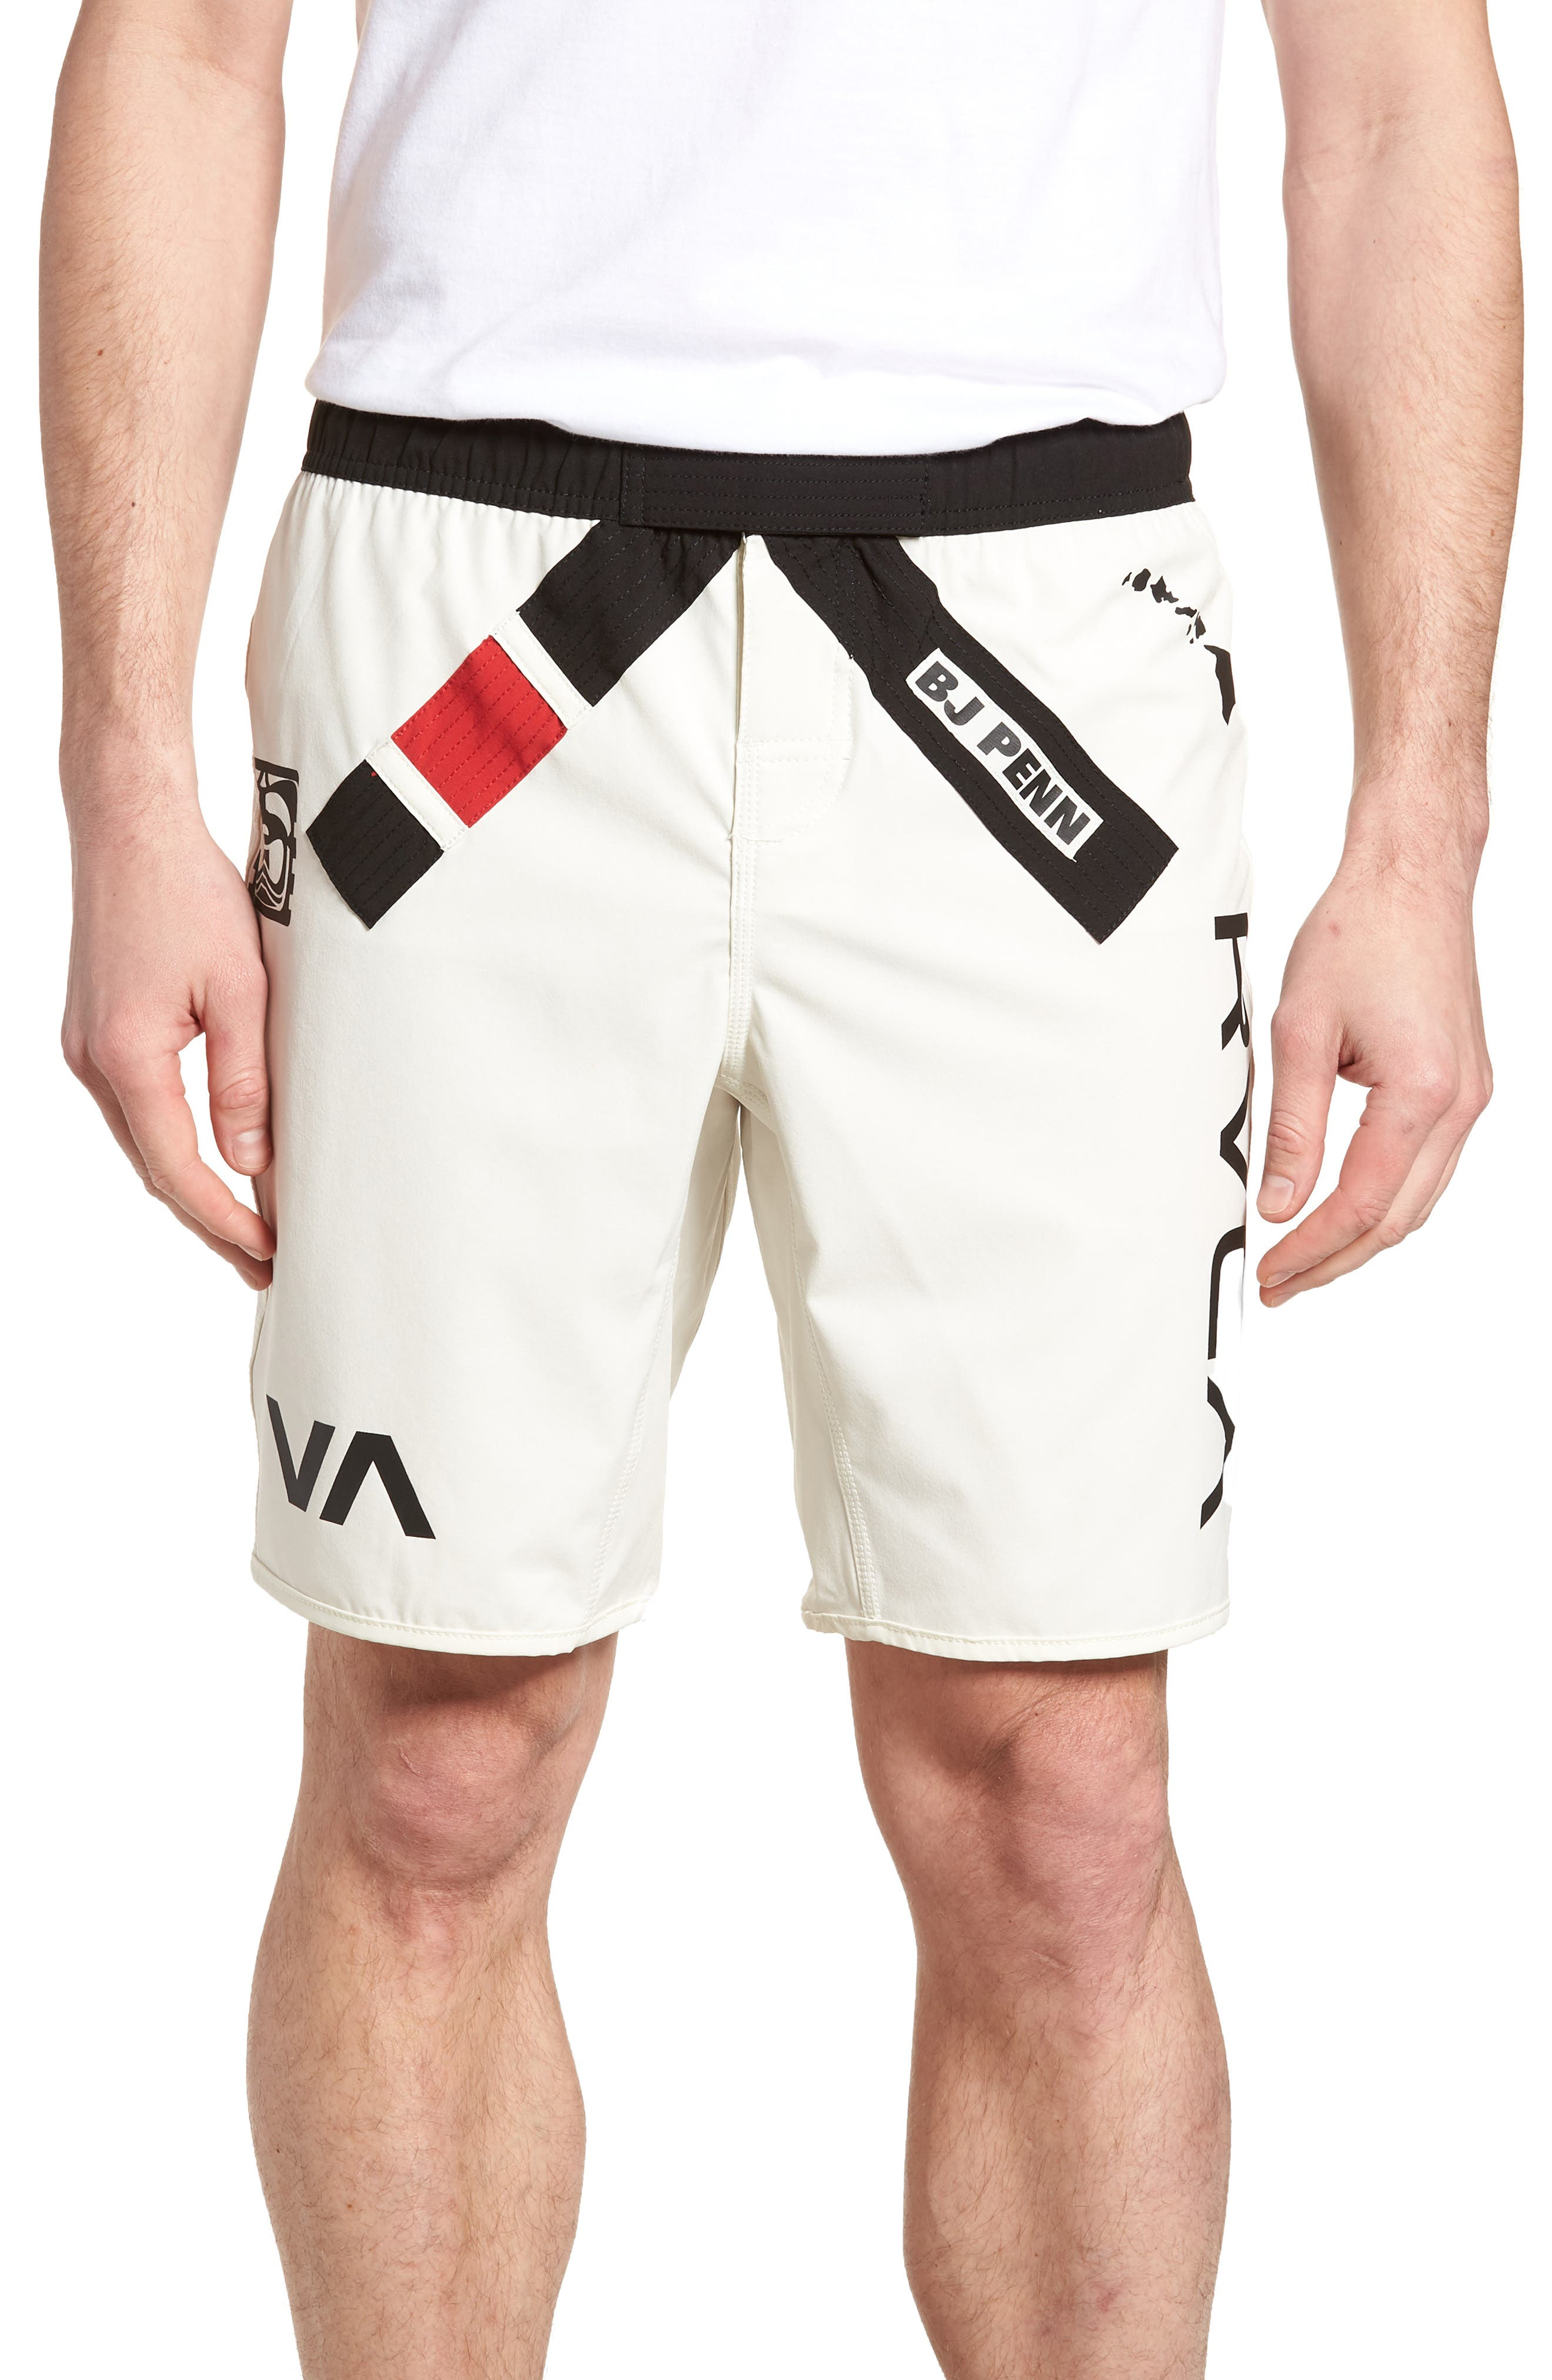 BJ Penn Legend Shorts,                         Main,                         color, White